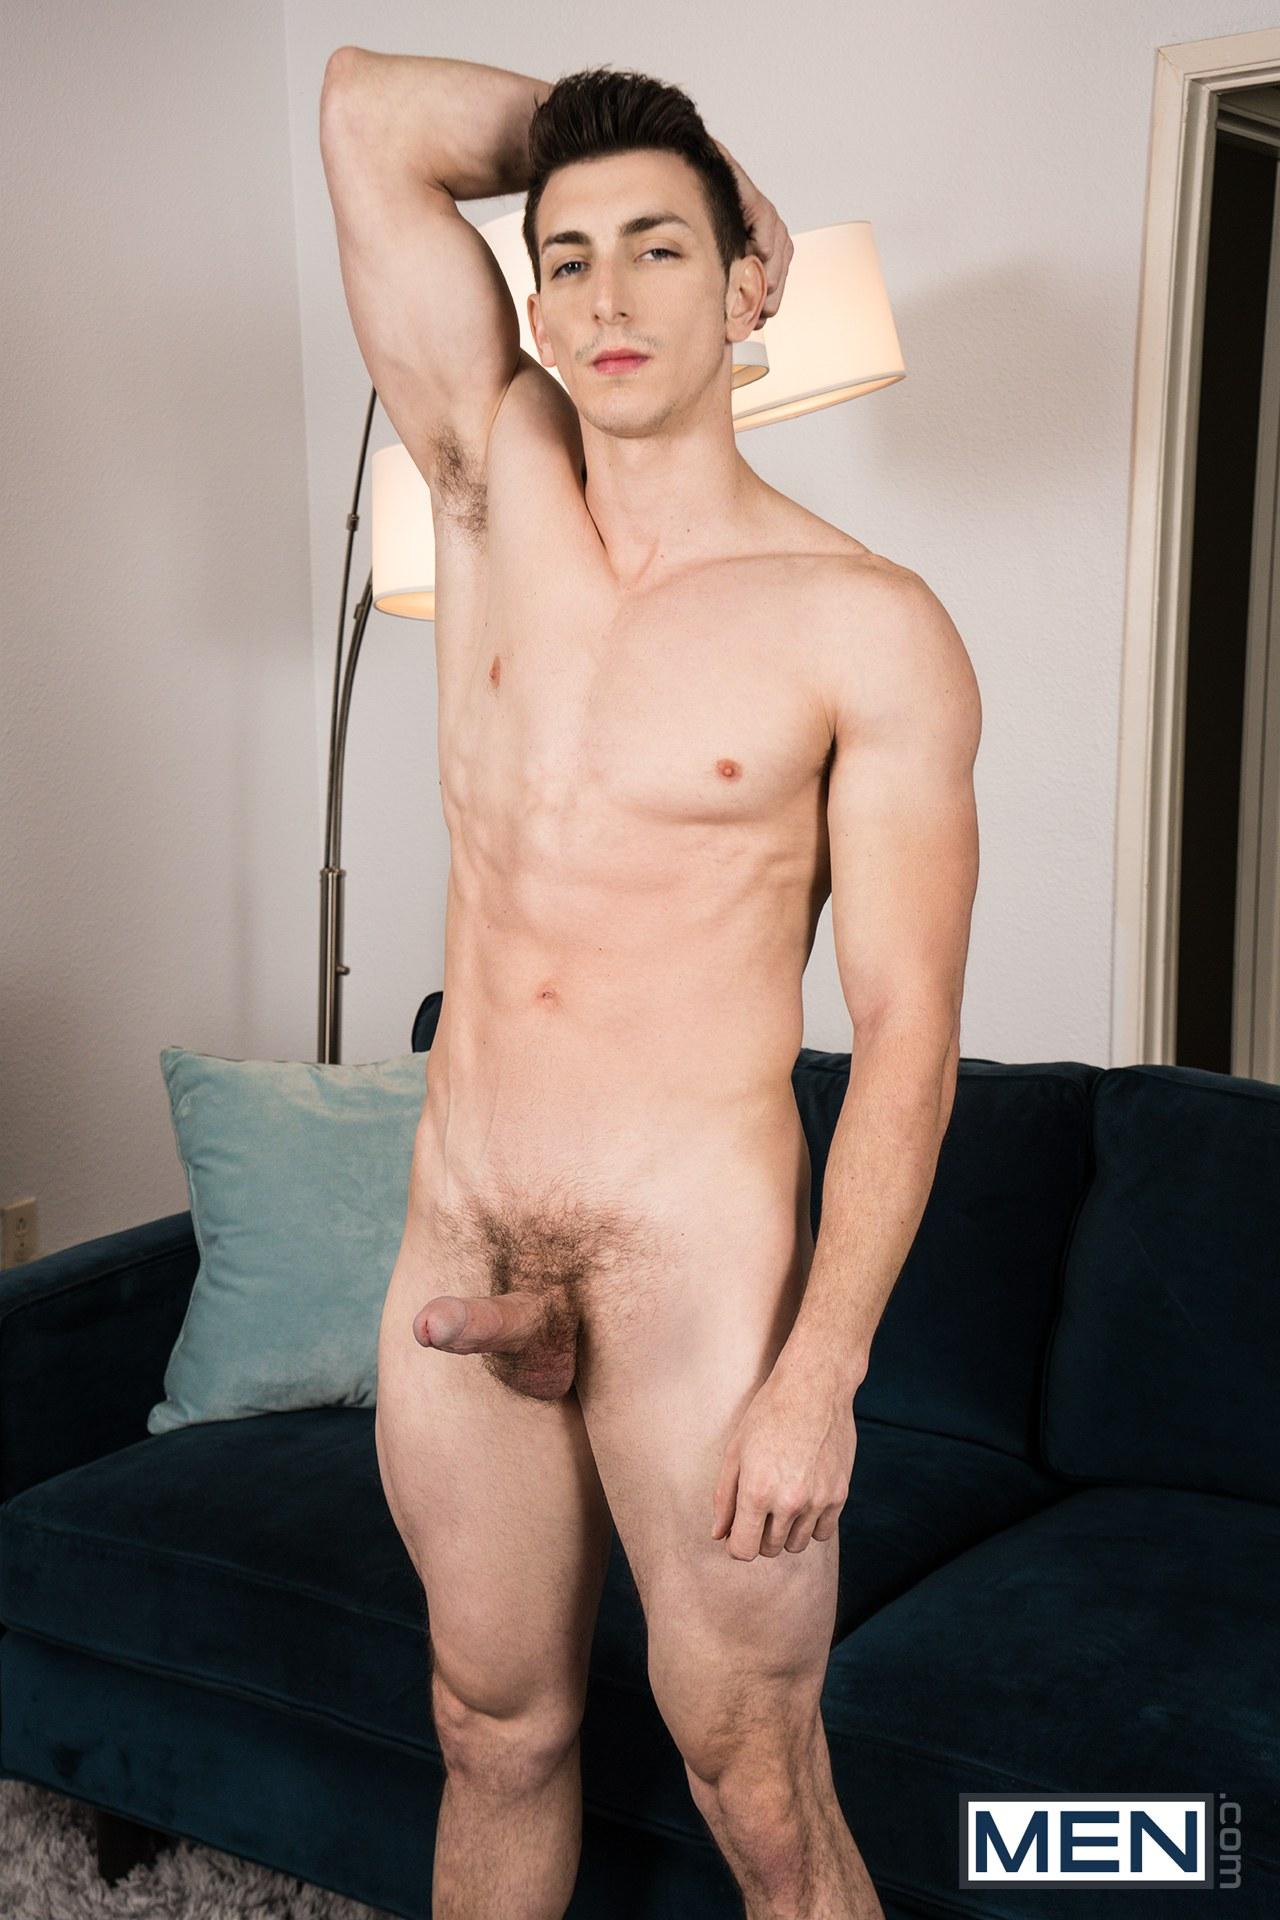 Horny guys making hardcore gay porn